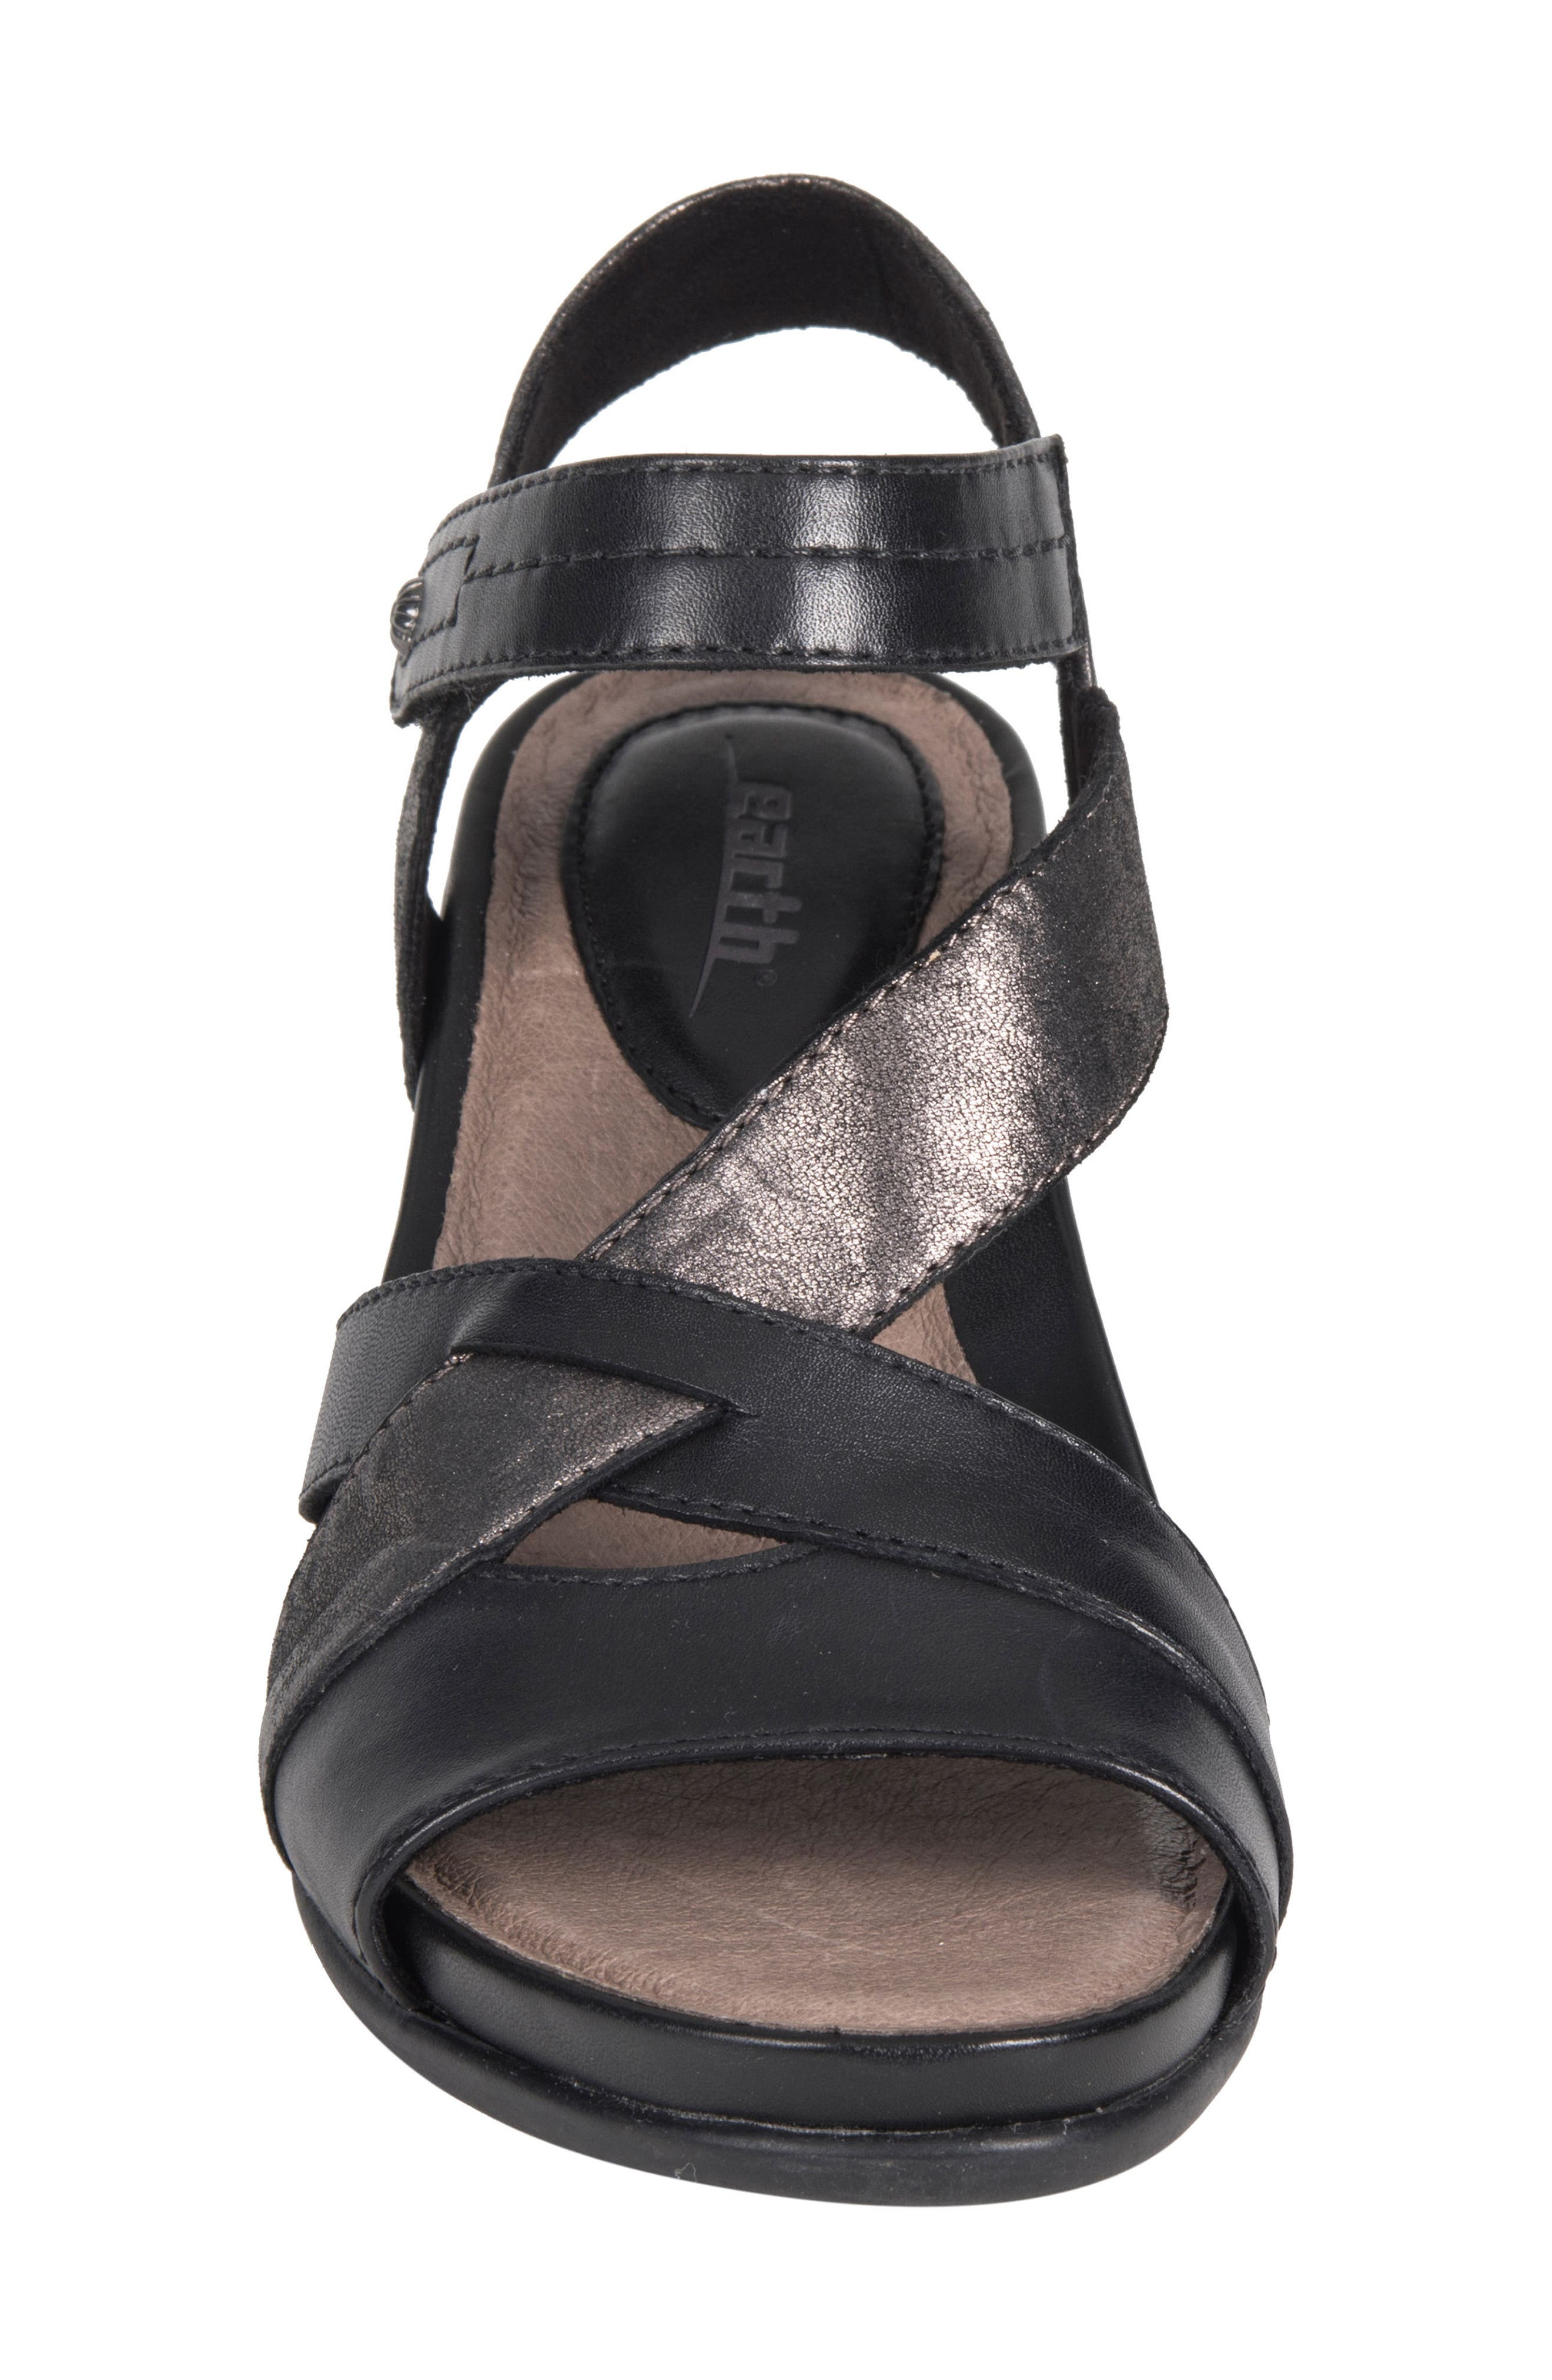 Thistle Wedge Sandal,                             Alternate thumbnail 3, color,                             001